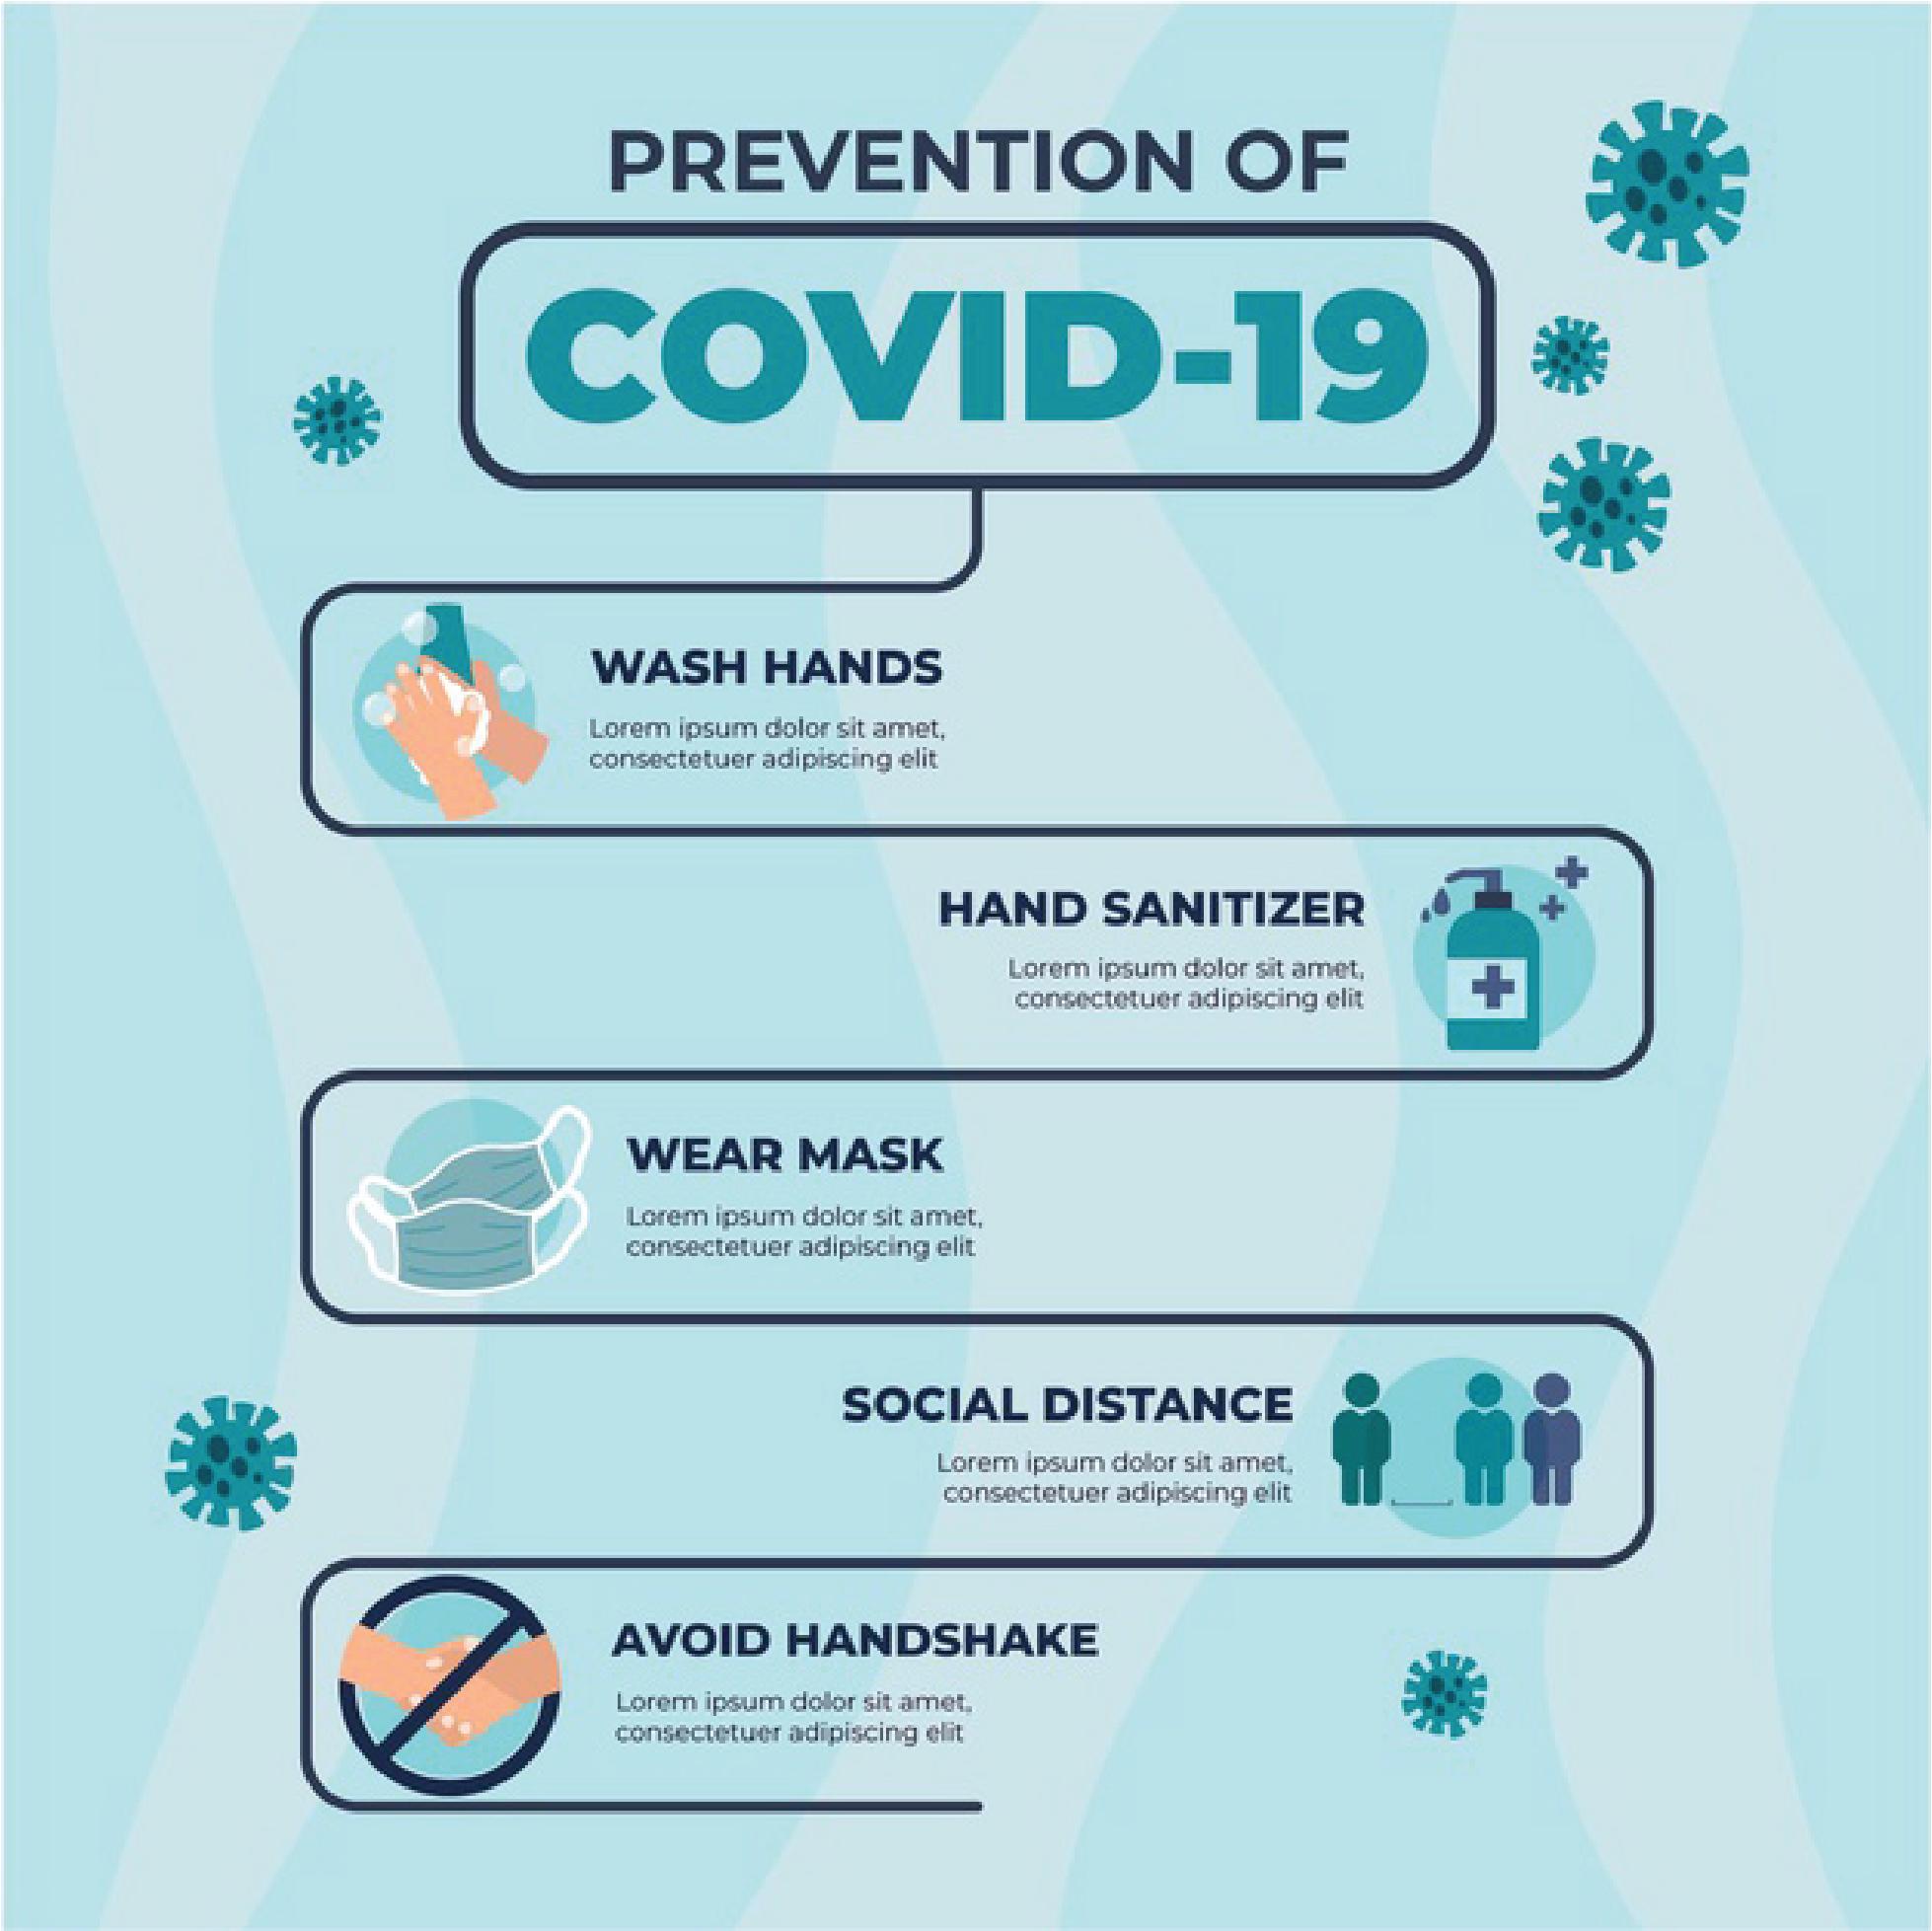 Covid_19 infographic